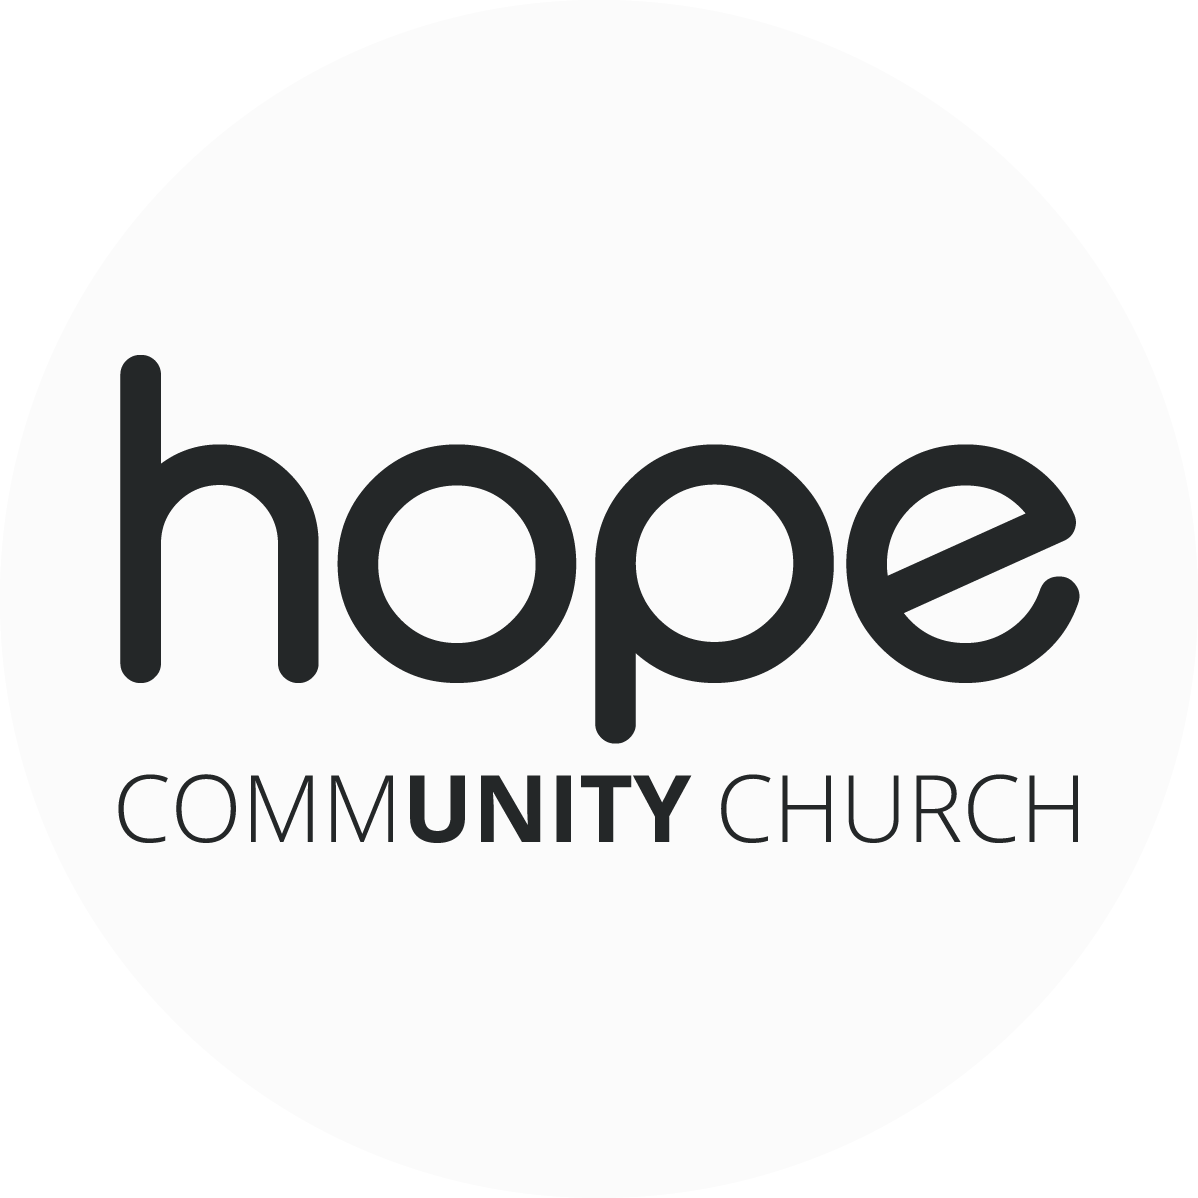 hcc-logo-circle-light